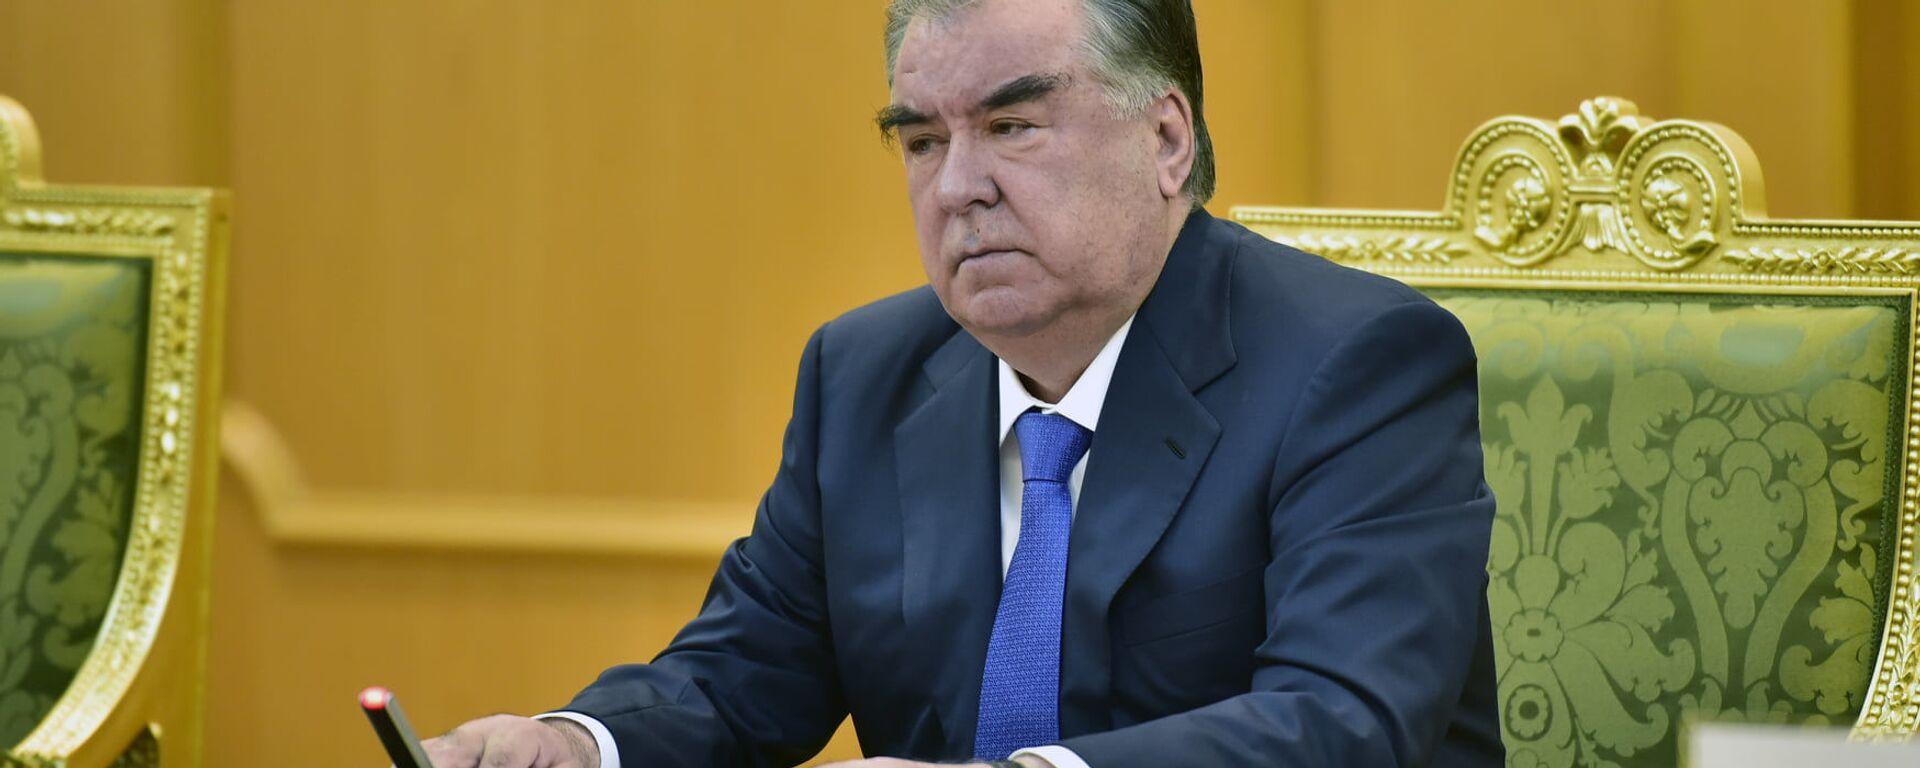 Президент Республики Таджикистан Эмомали Рахмон - Sputnik Таджикистан, 1920, 19.05.2021